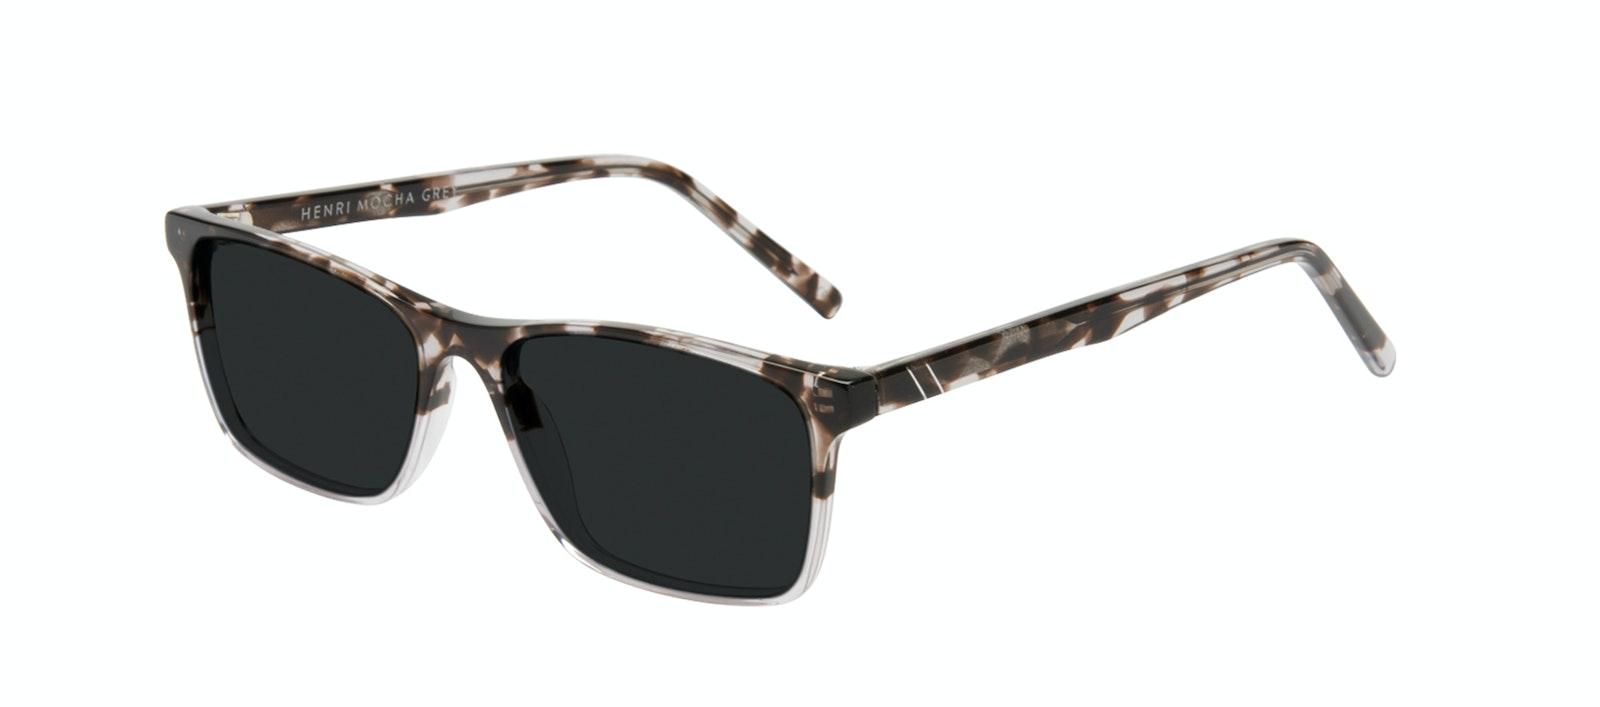 Affordable Fashion Glasses Rectangle Sunglasses Men Henri Mocha Grey Tilt